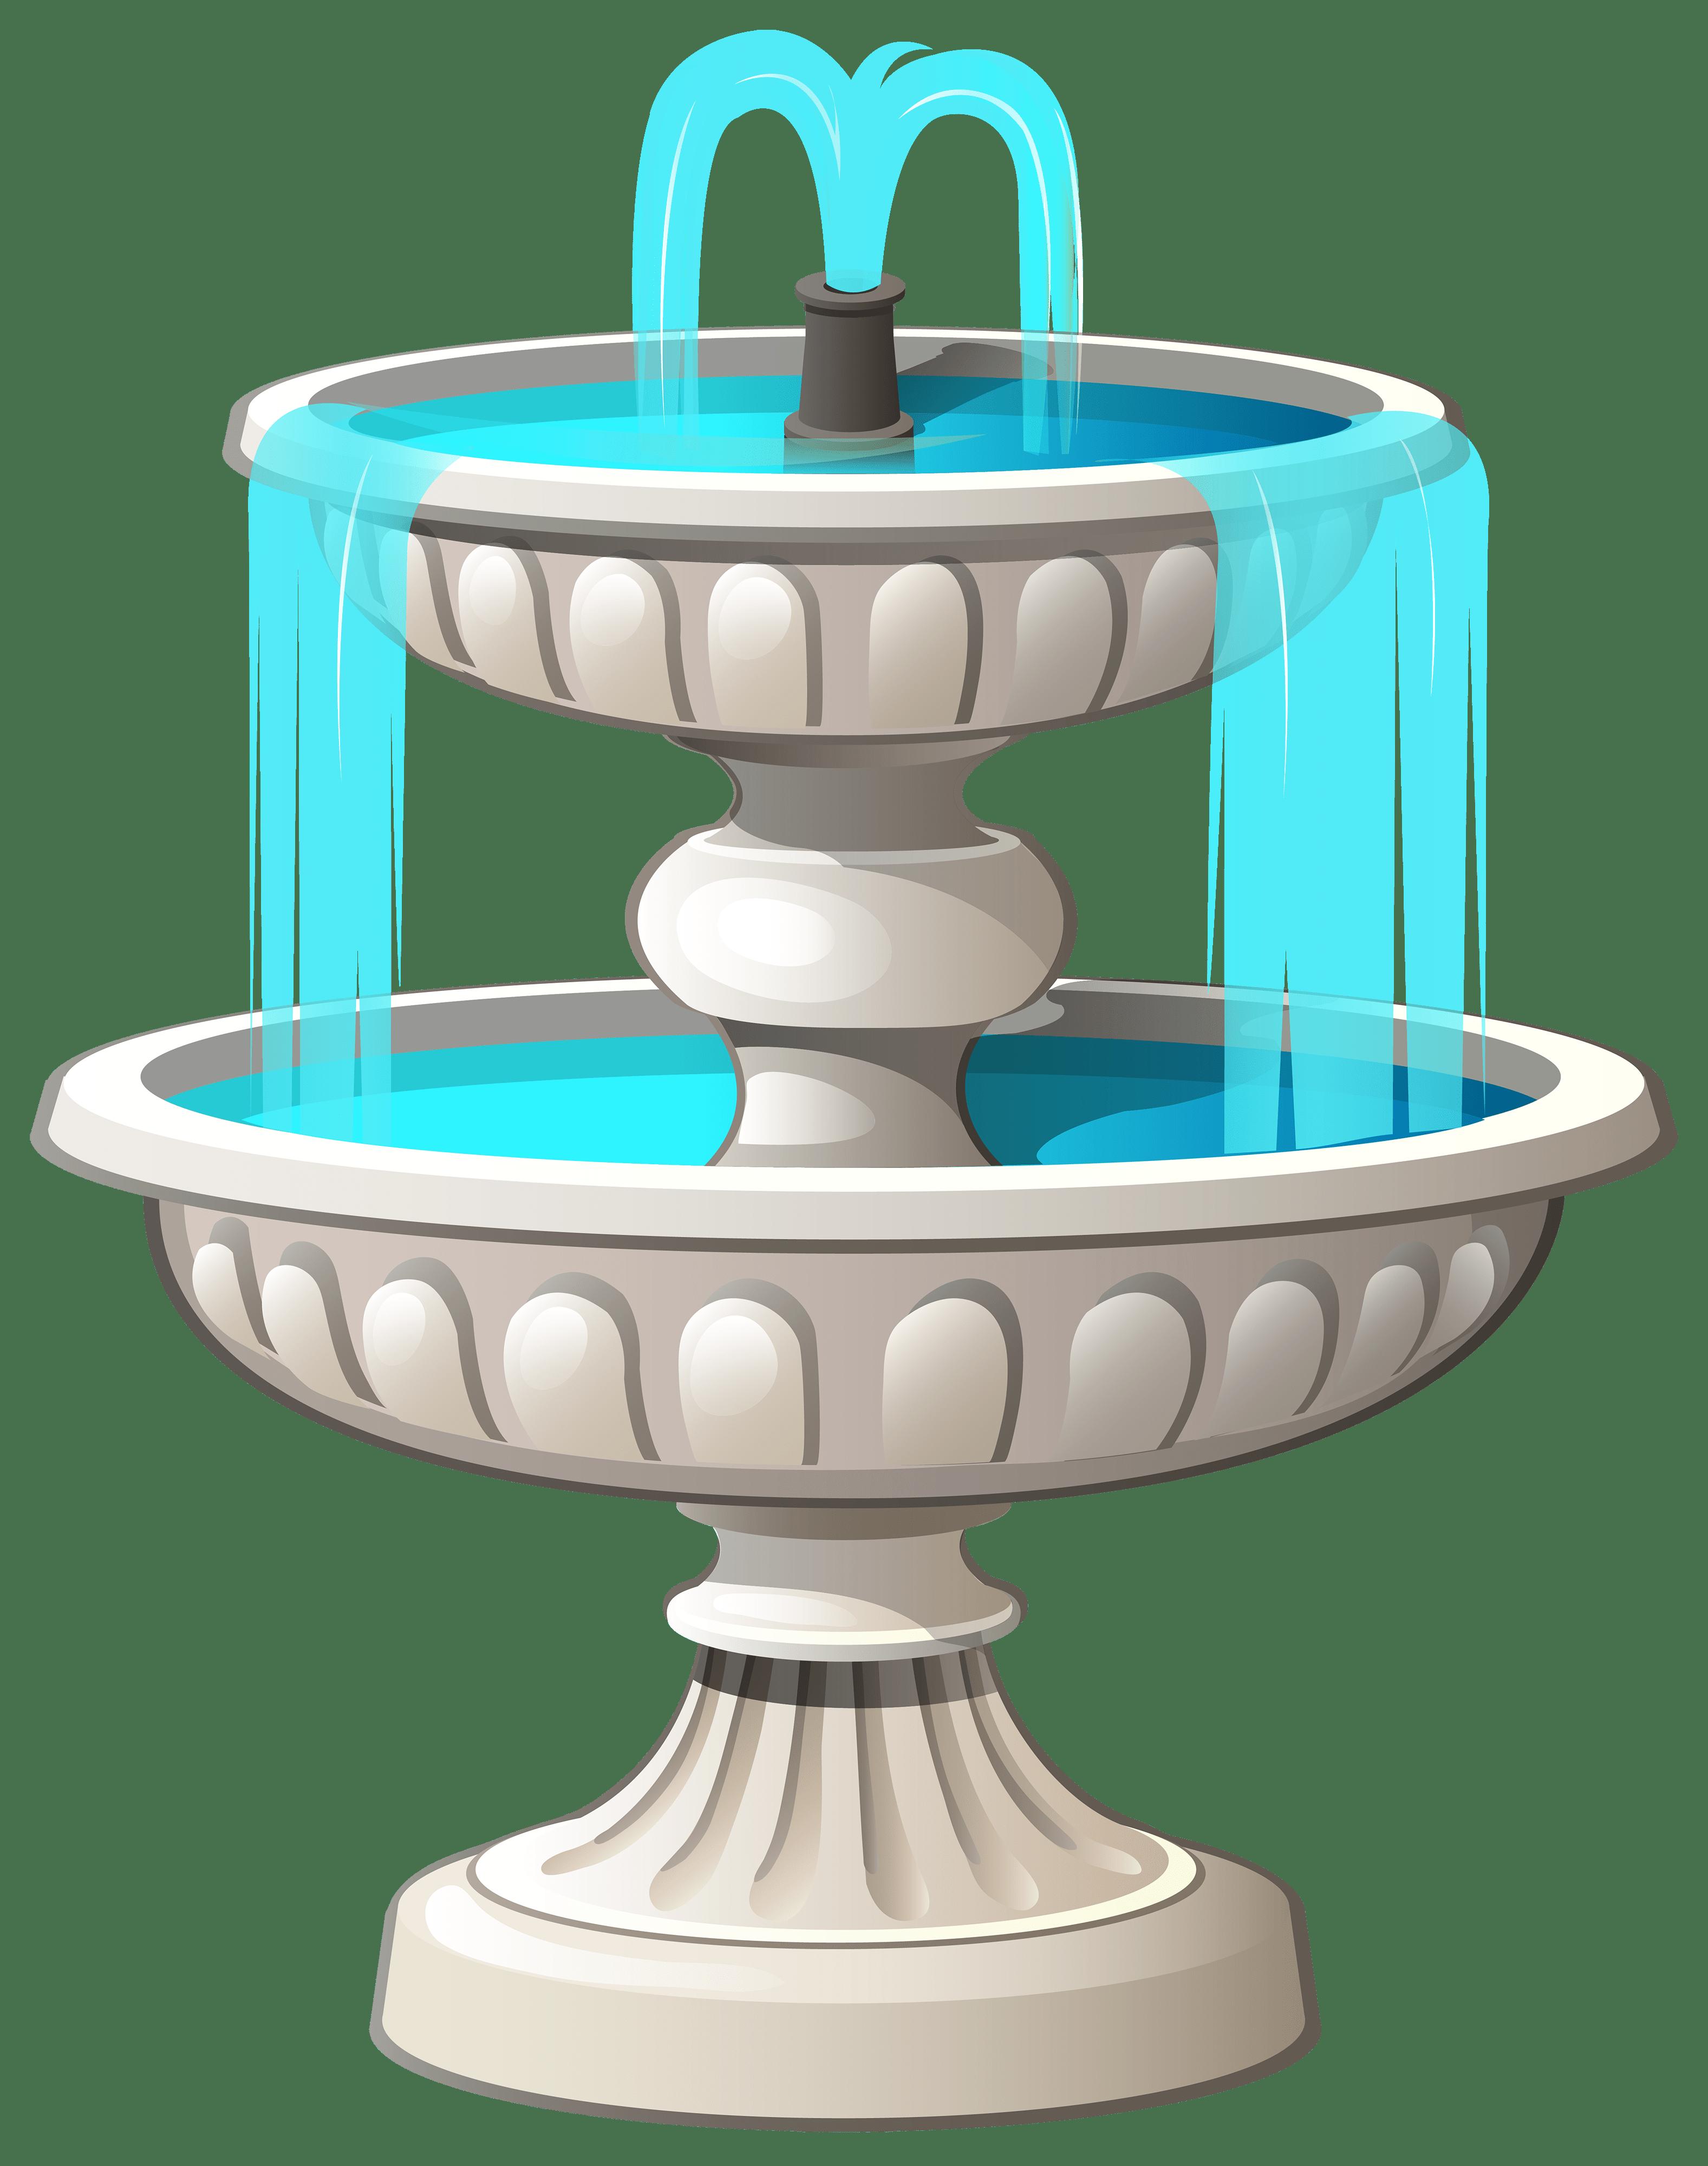 Fountain clipart plan.  transparent background dundjinni